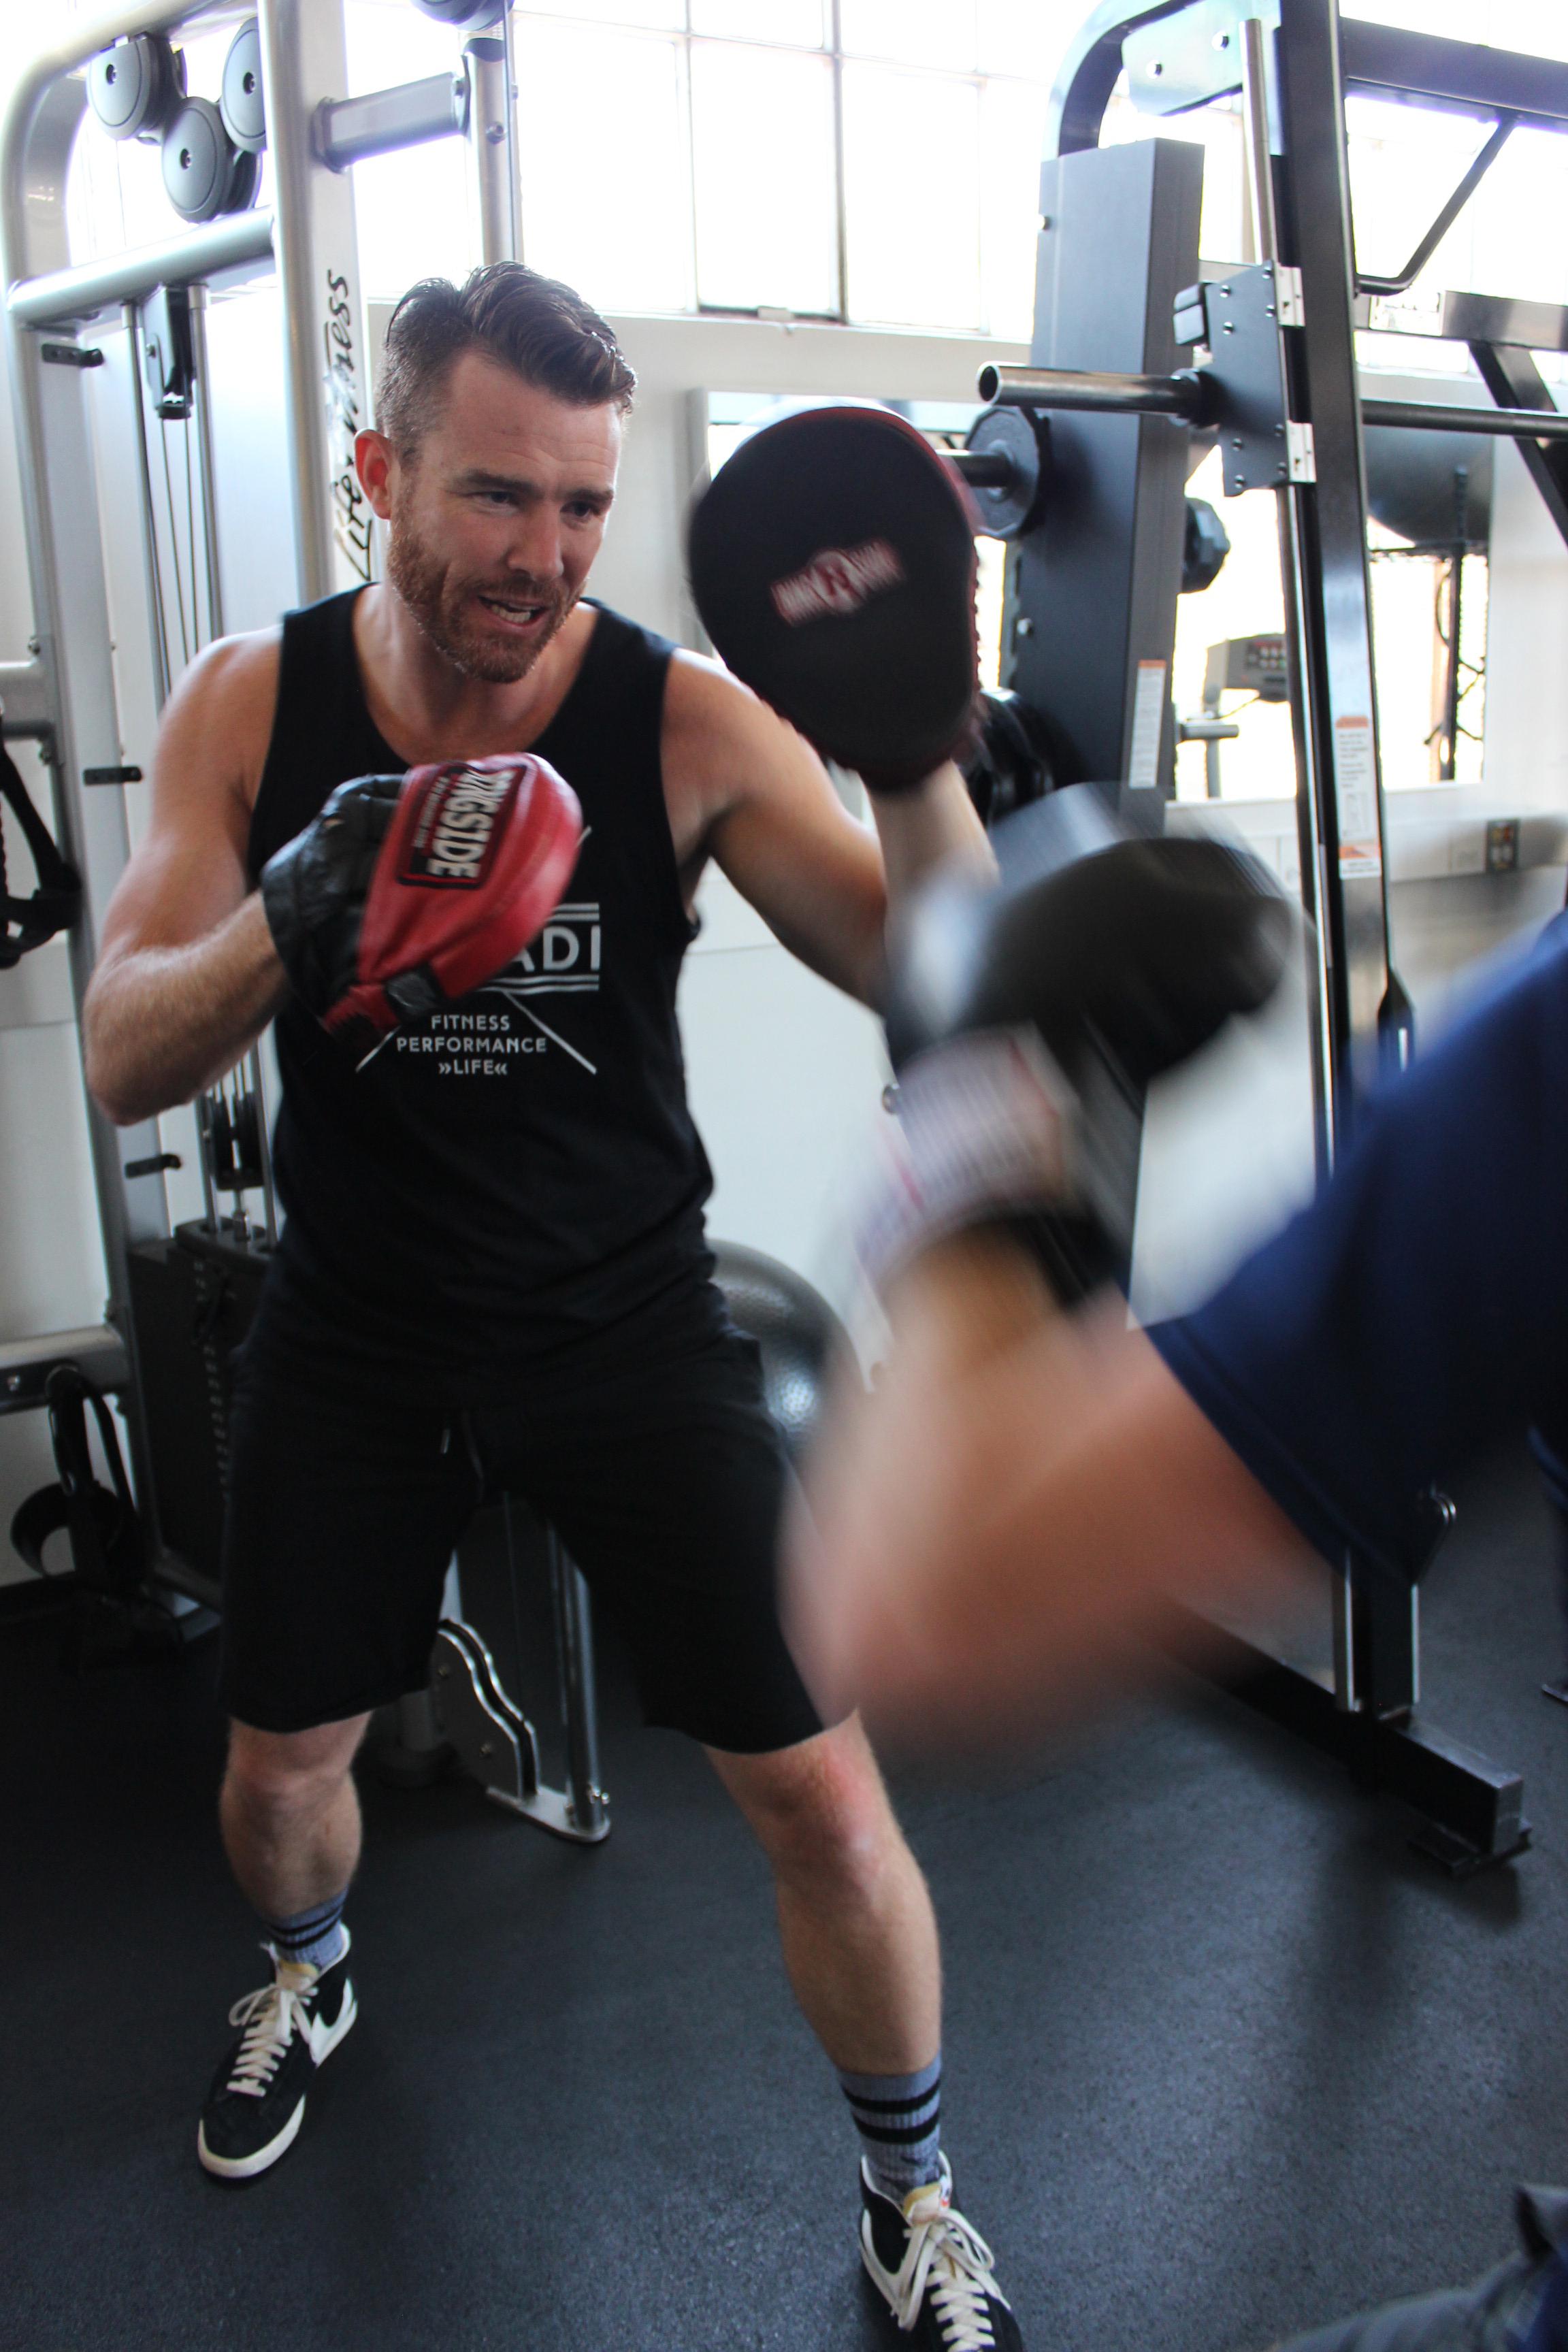 DIAKADI Trainer Gavin Birmingham boxing balance and coordination.jpg